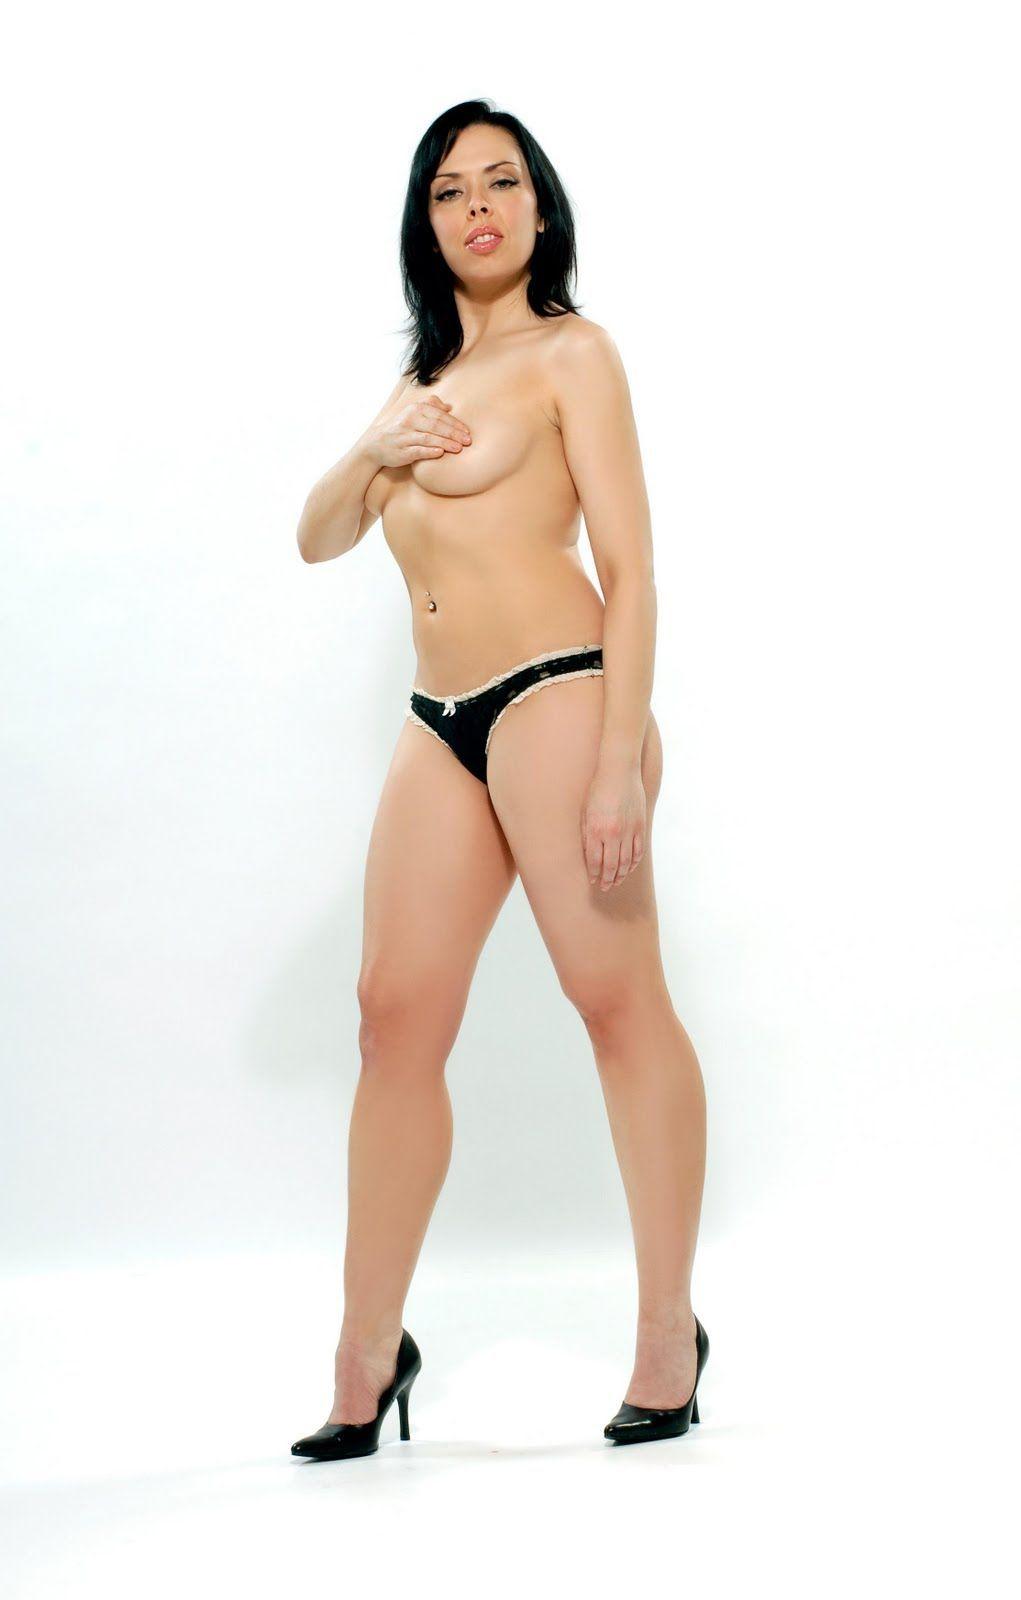 Naked news christine